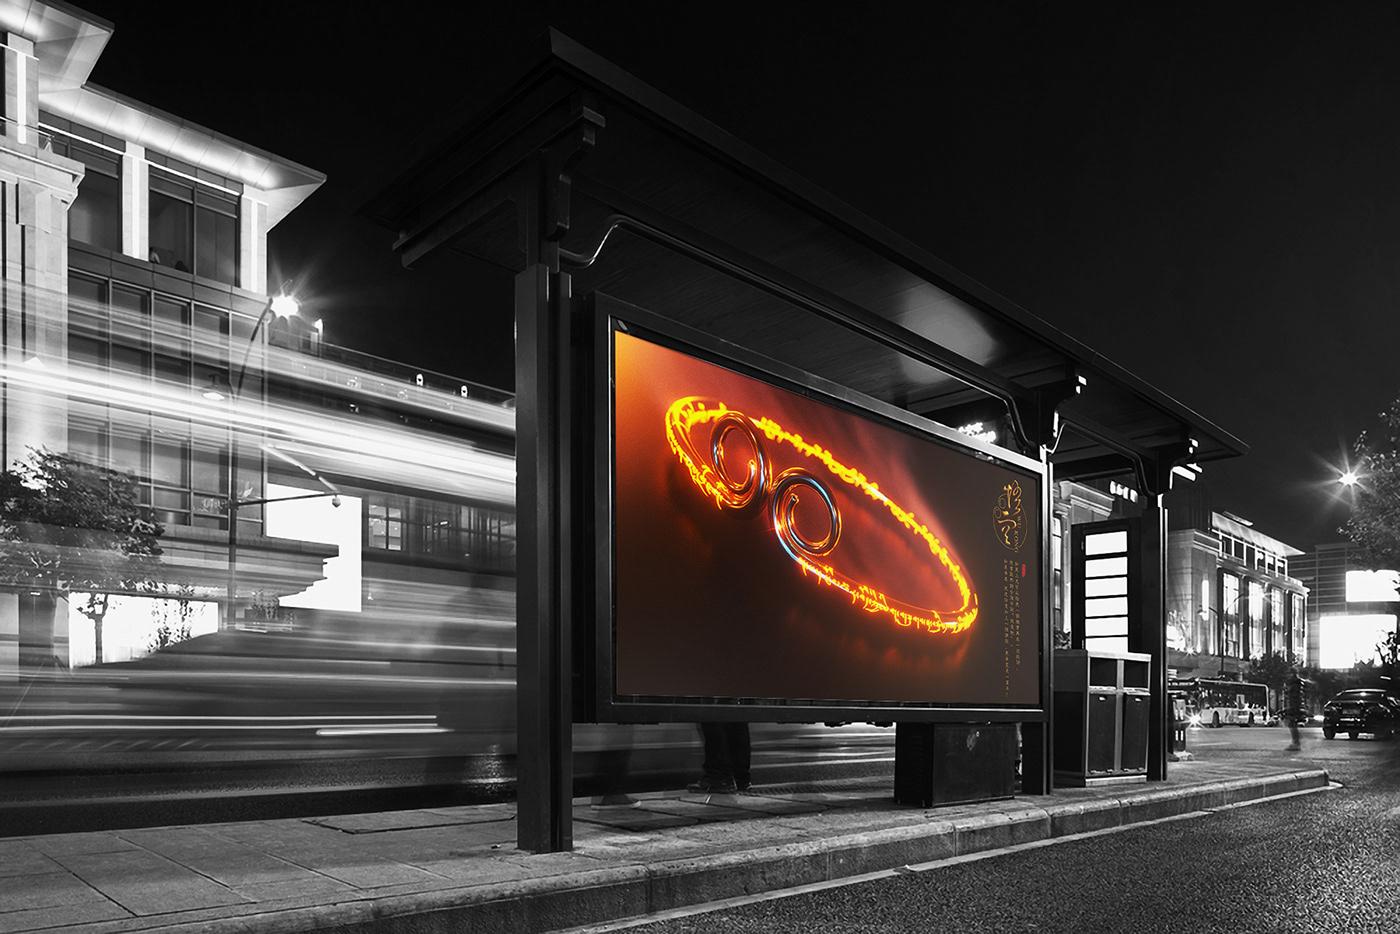 紧箍咒 创意设计 视频 大话西游 c4d design 3d design flame video animation